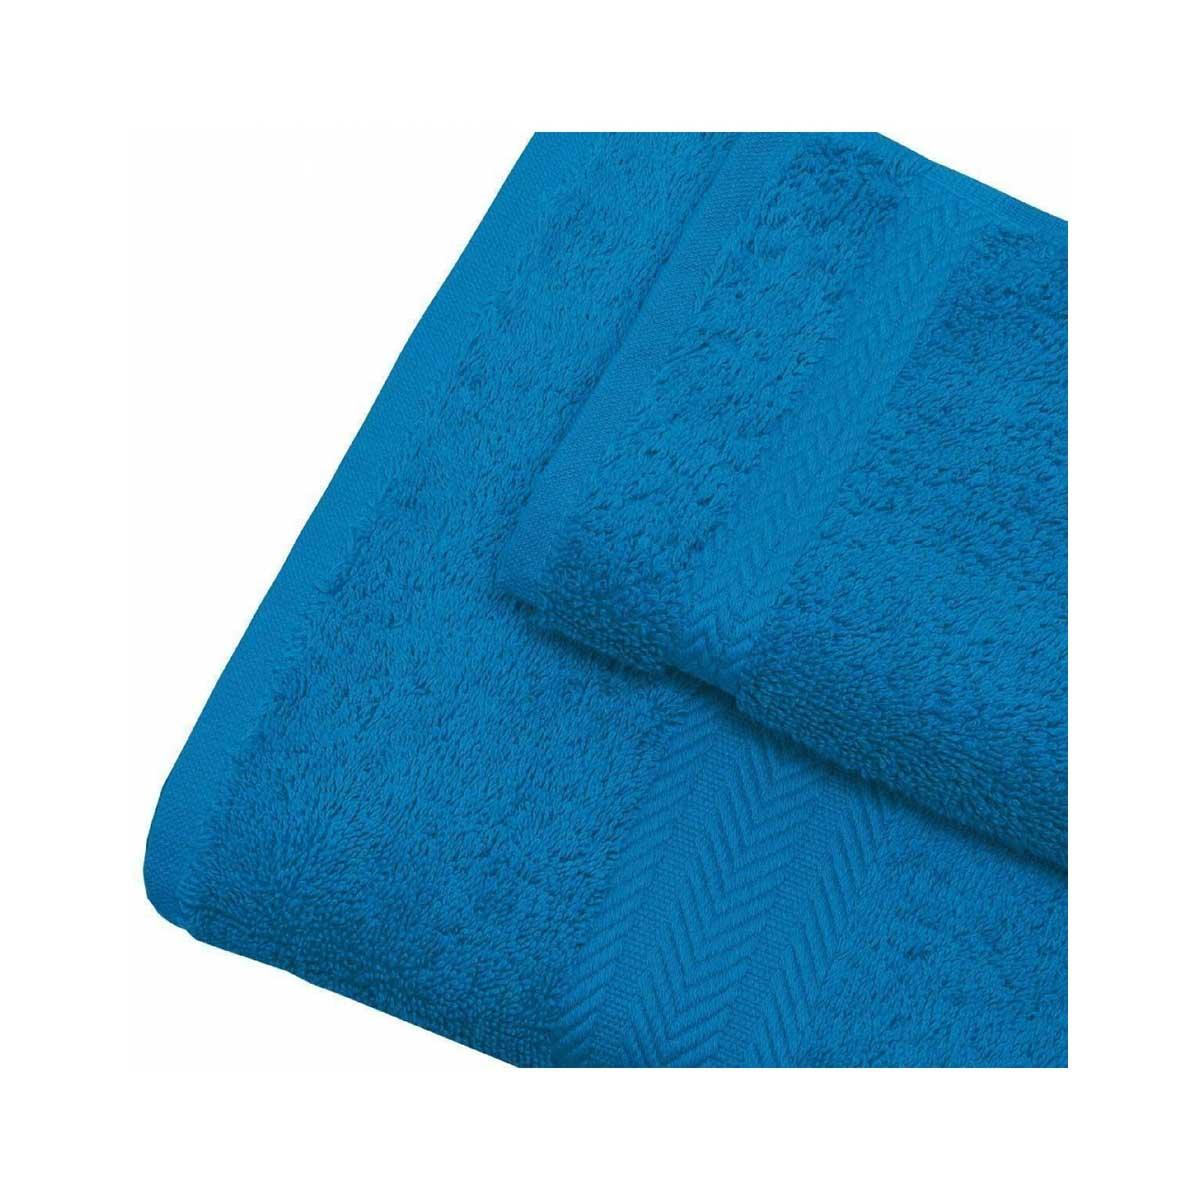 Linge de bain en coton 550gr/m² océan (Ocean)